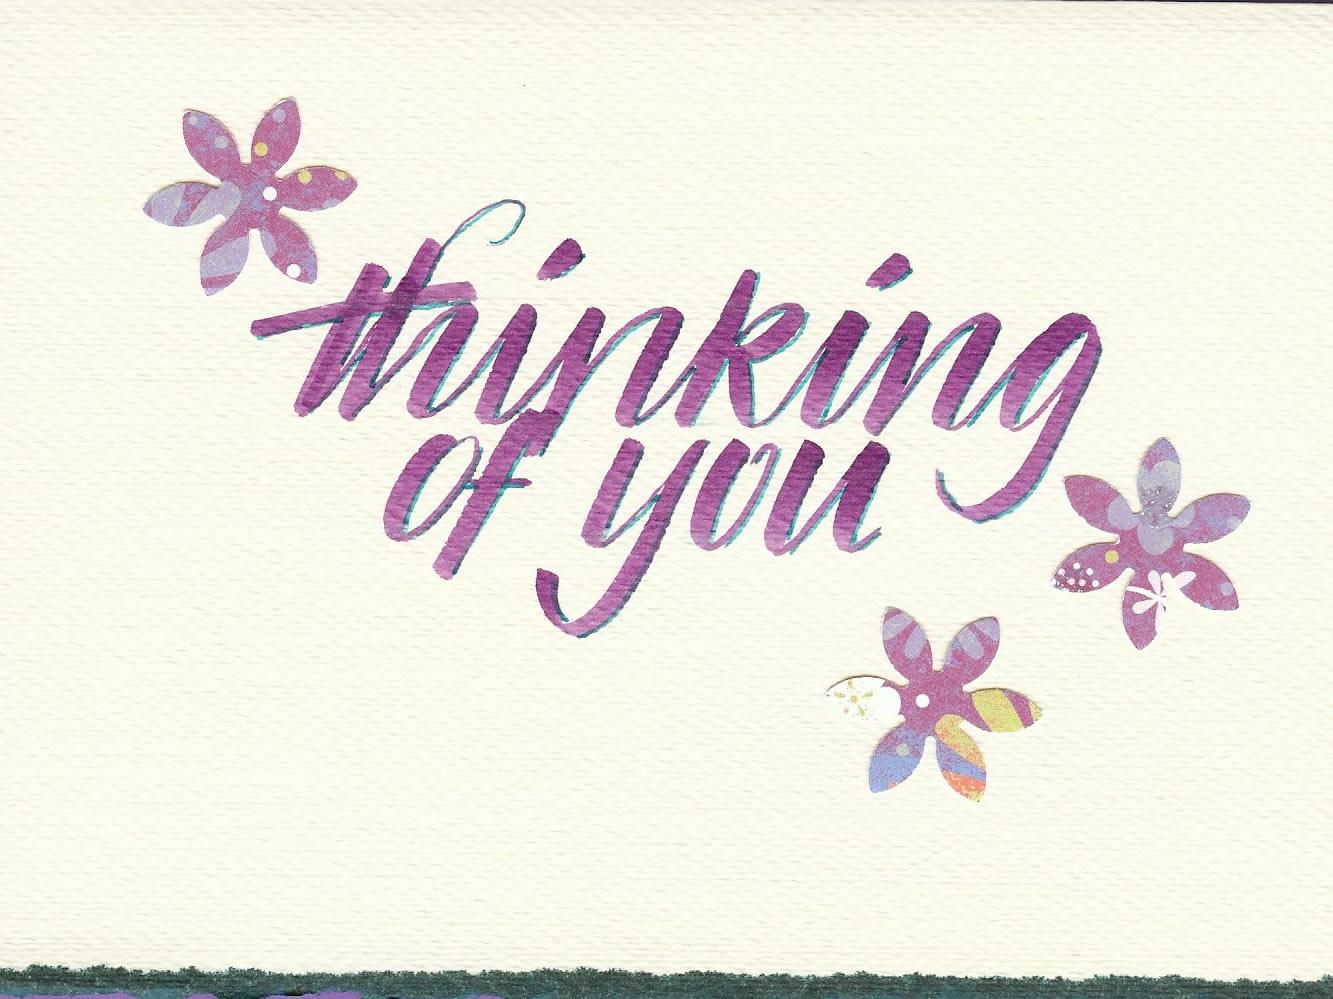 Violet Smythe (thinking of you card)